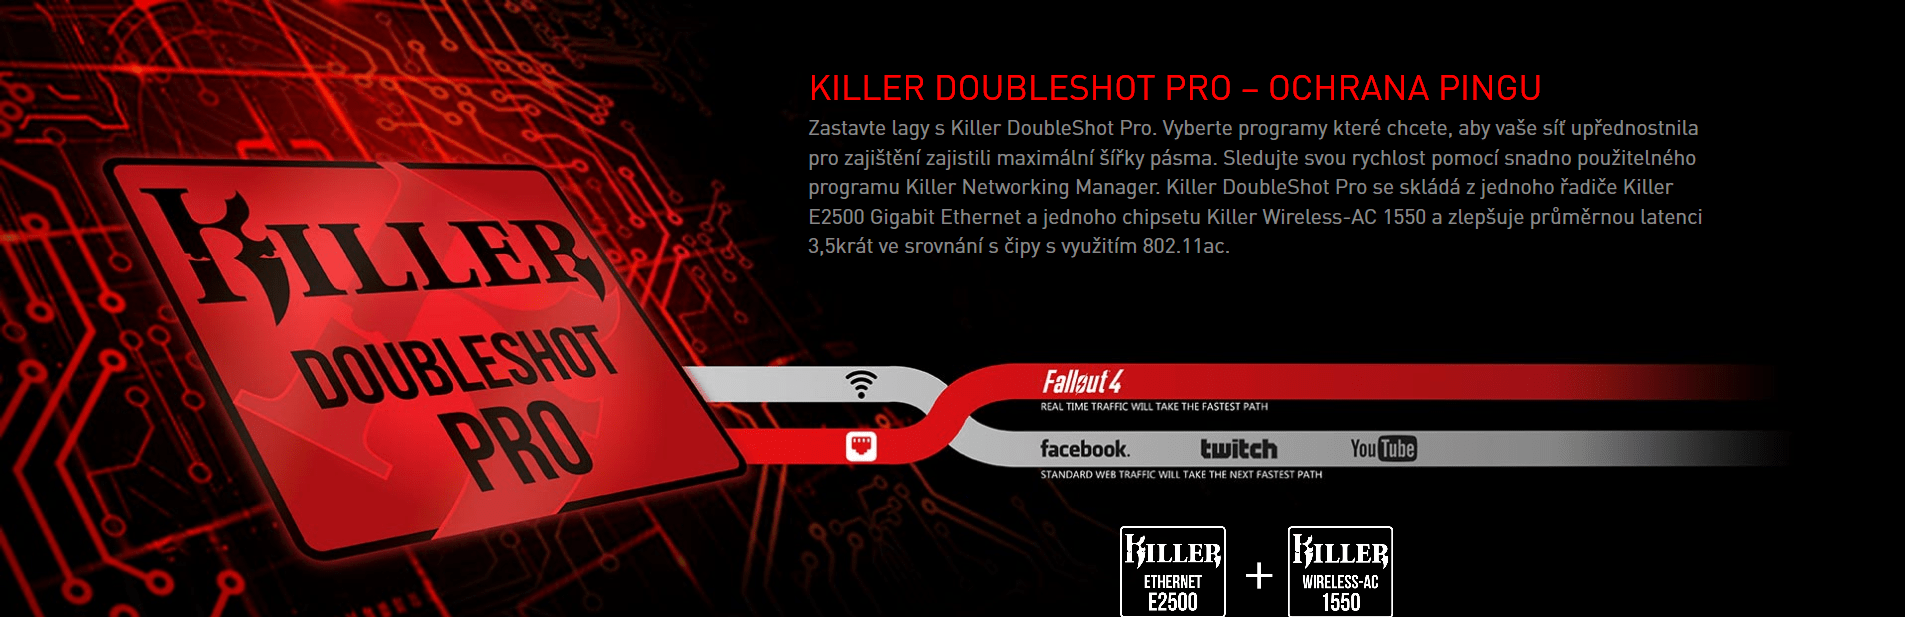 Killer DoubleShot Pro – Ochrana pingu